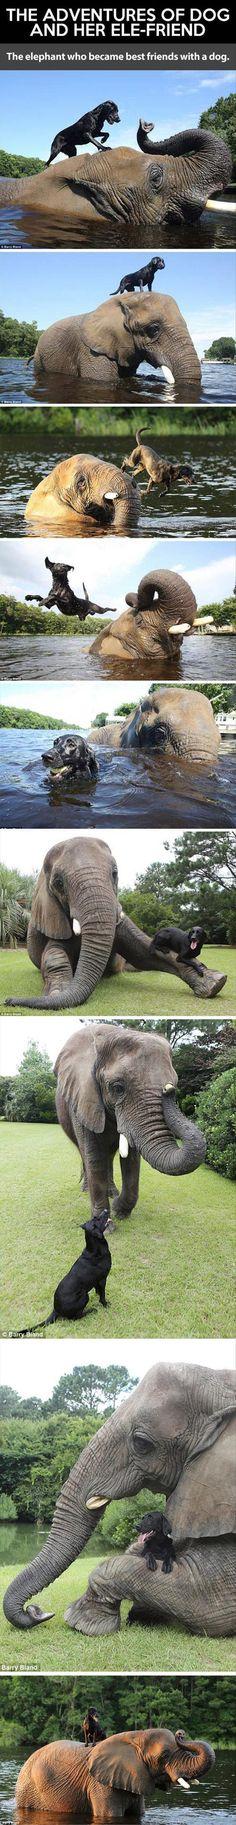 Dogs Elephant Friendship